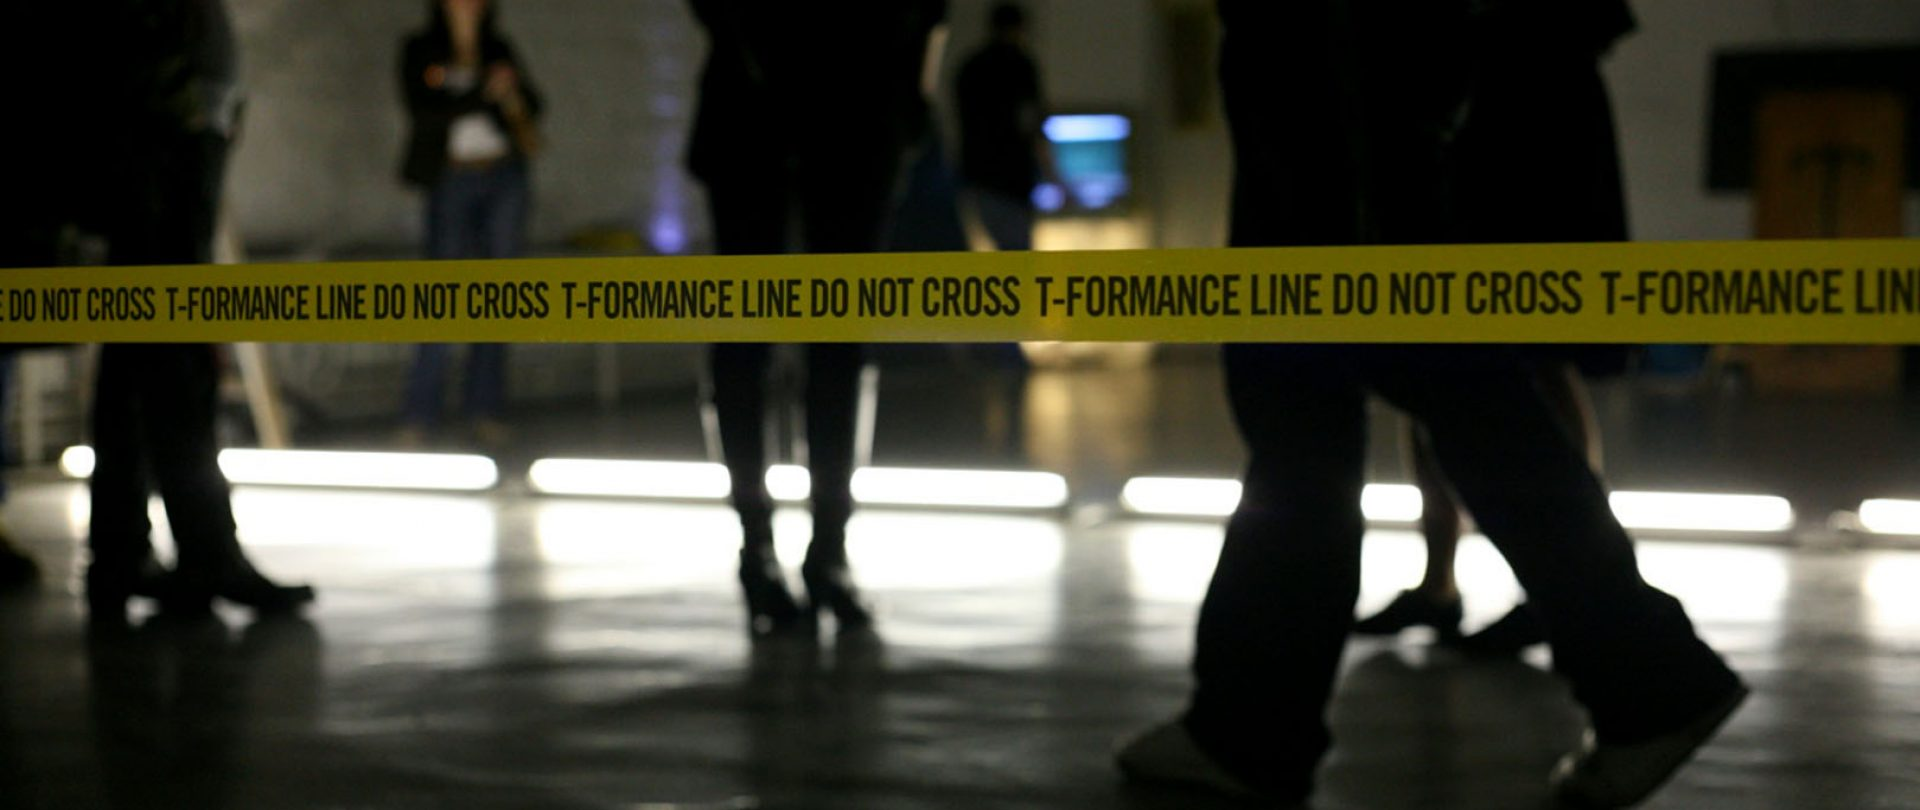 T-FORMANCE